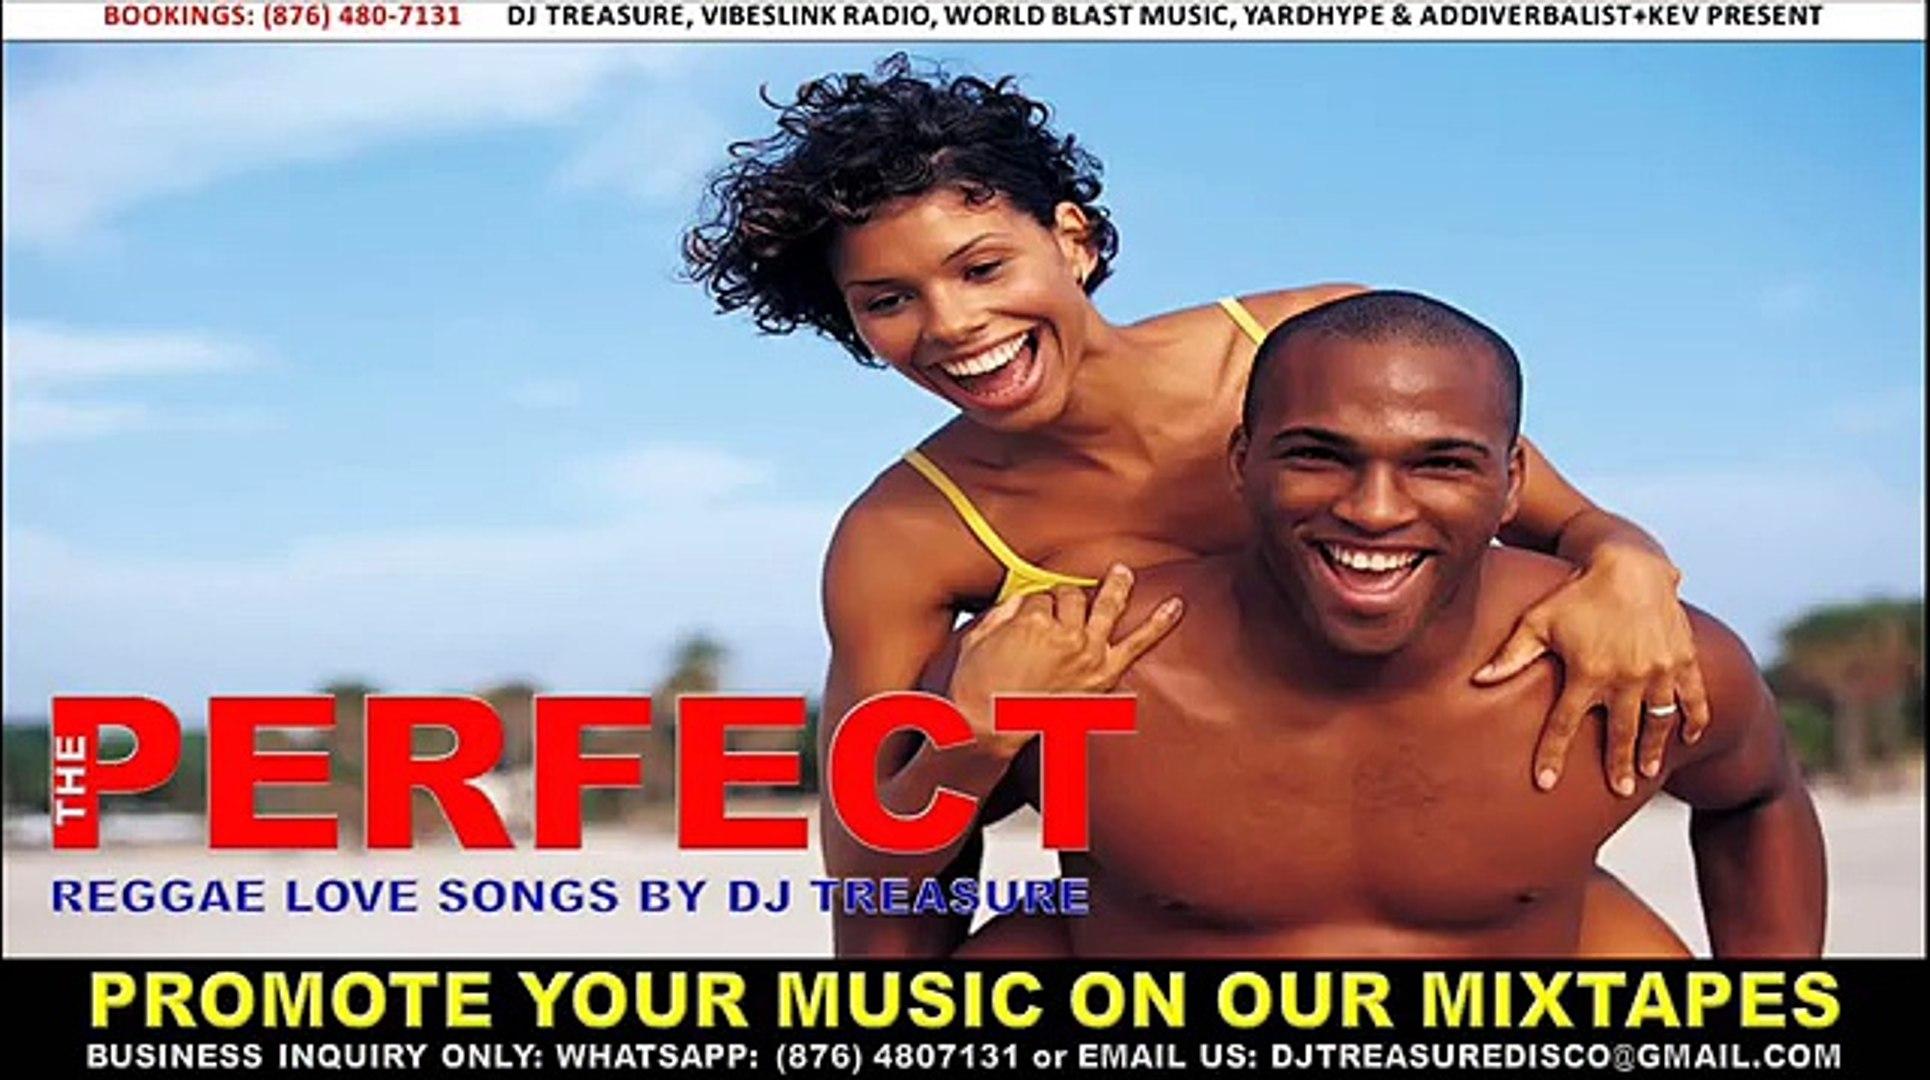 PERFECT REGGAE LOVE SONGS MIXTAPE by DJ TREASURE║LOVERS ROCK║NOVEMBER 2016